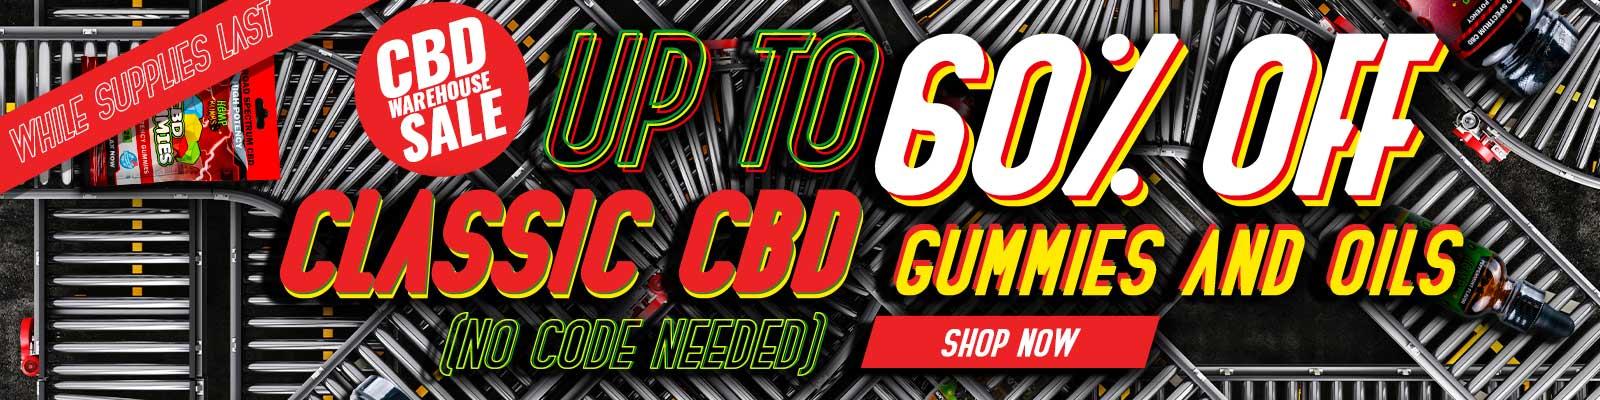 CBD Warehouse Sale